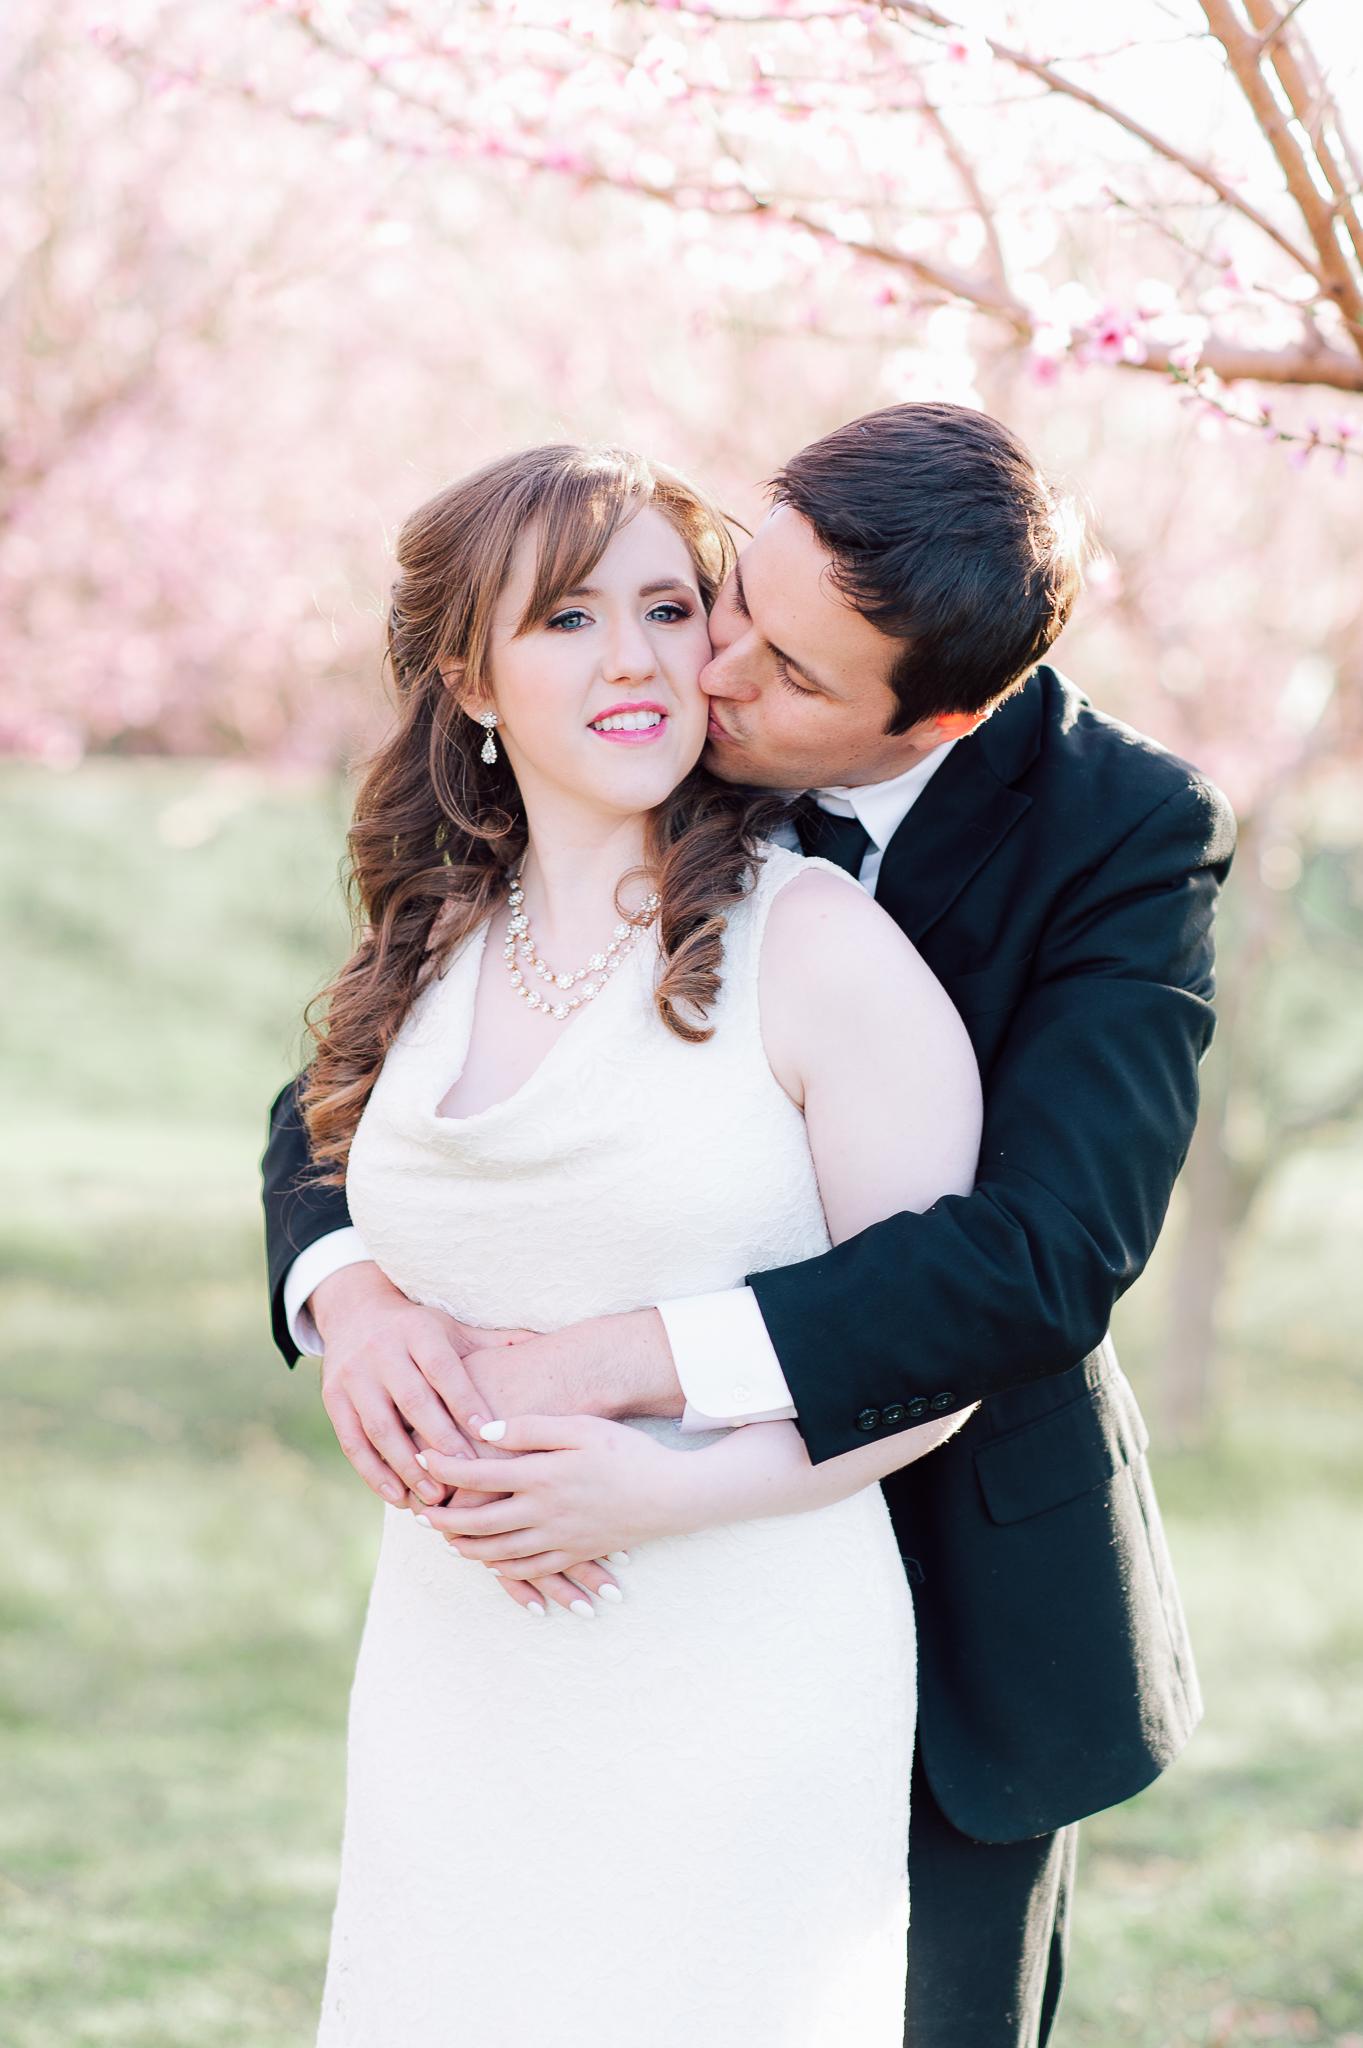 springwedding_cherryblossoms_virginiaphotographer_youseephotography_styledshoot (551).jpg